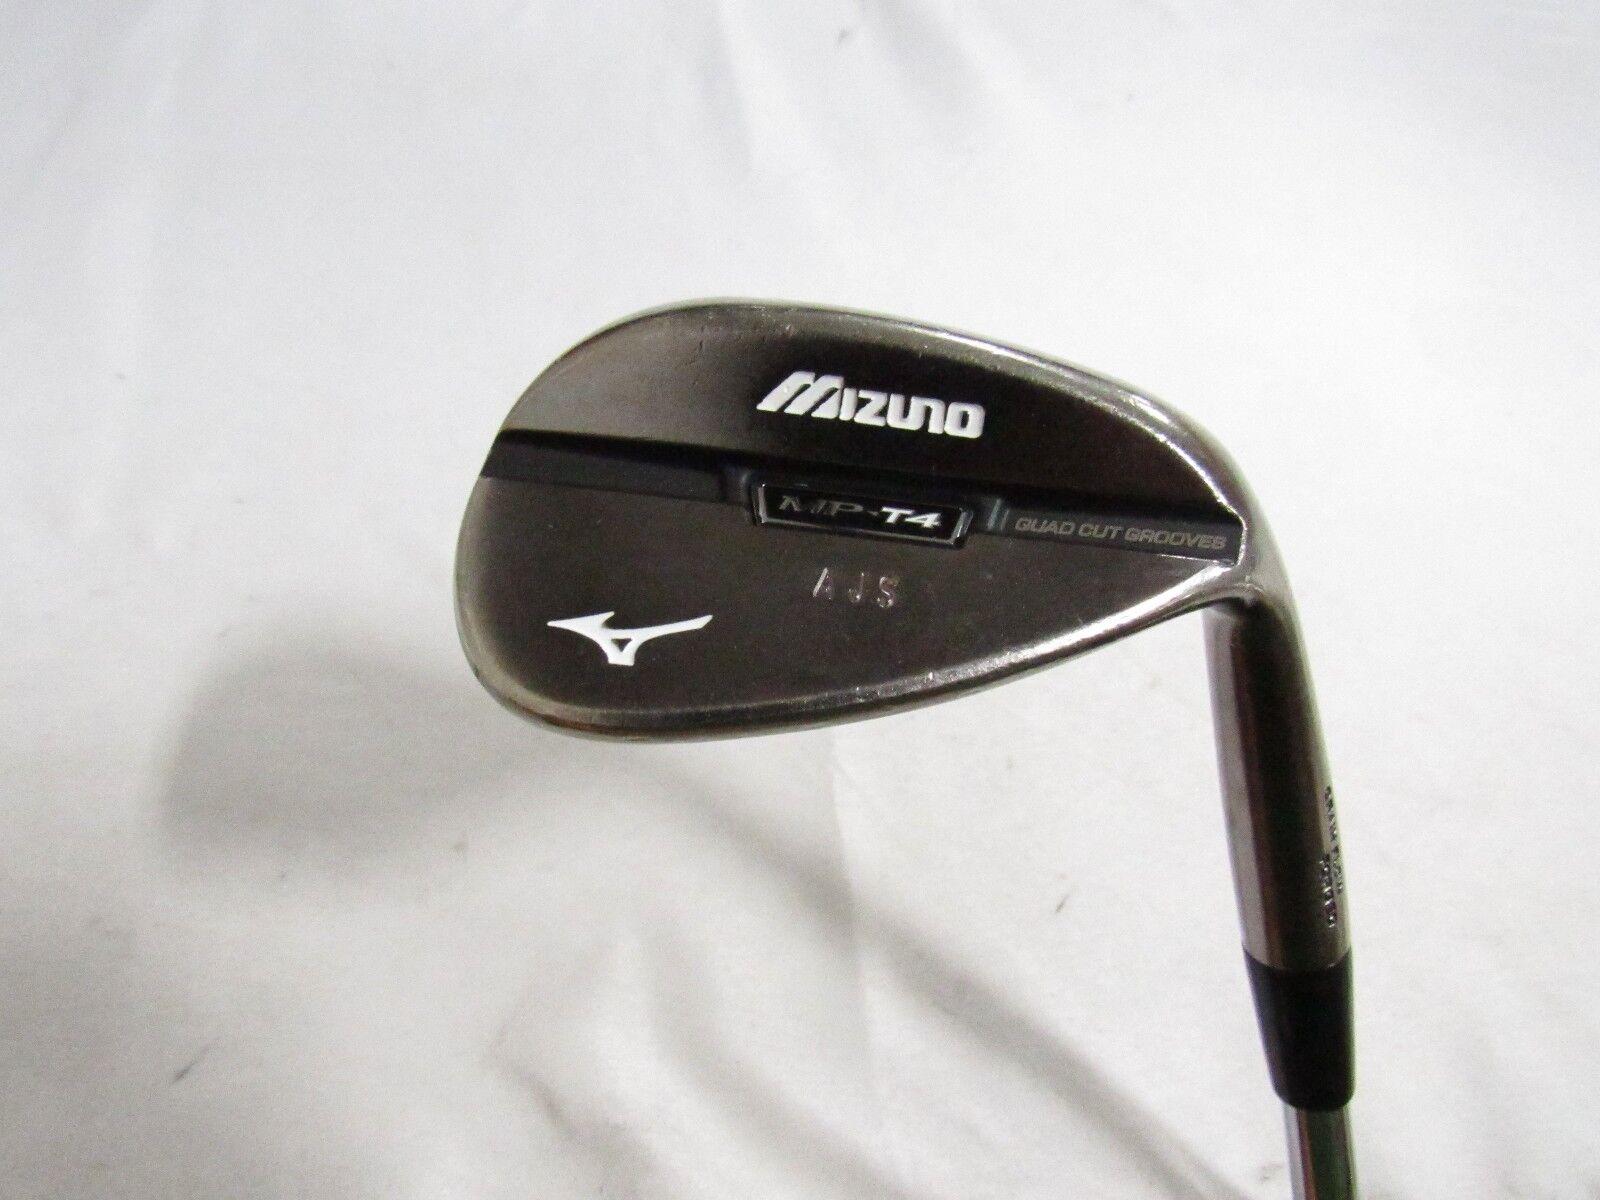 Utiliza la mano derecha Mizuno MP-T4 (Negro)  Sand Wedge 54.09  Cuña De Acero KBS Tour Flex W  barato